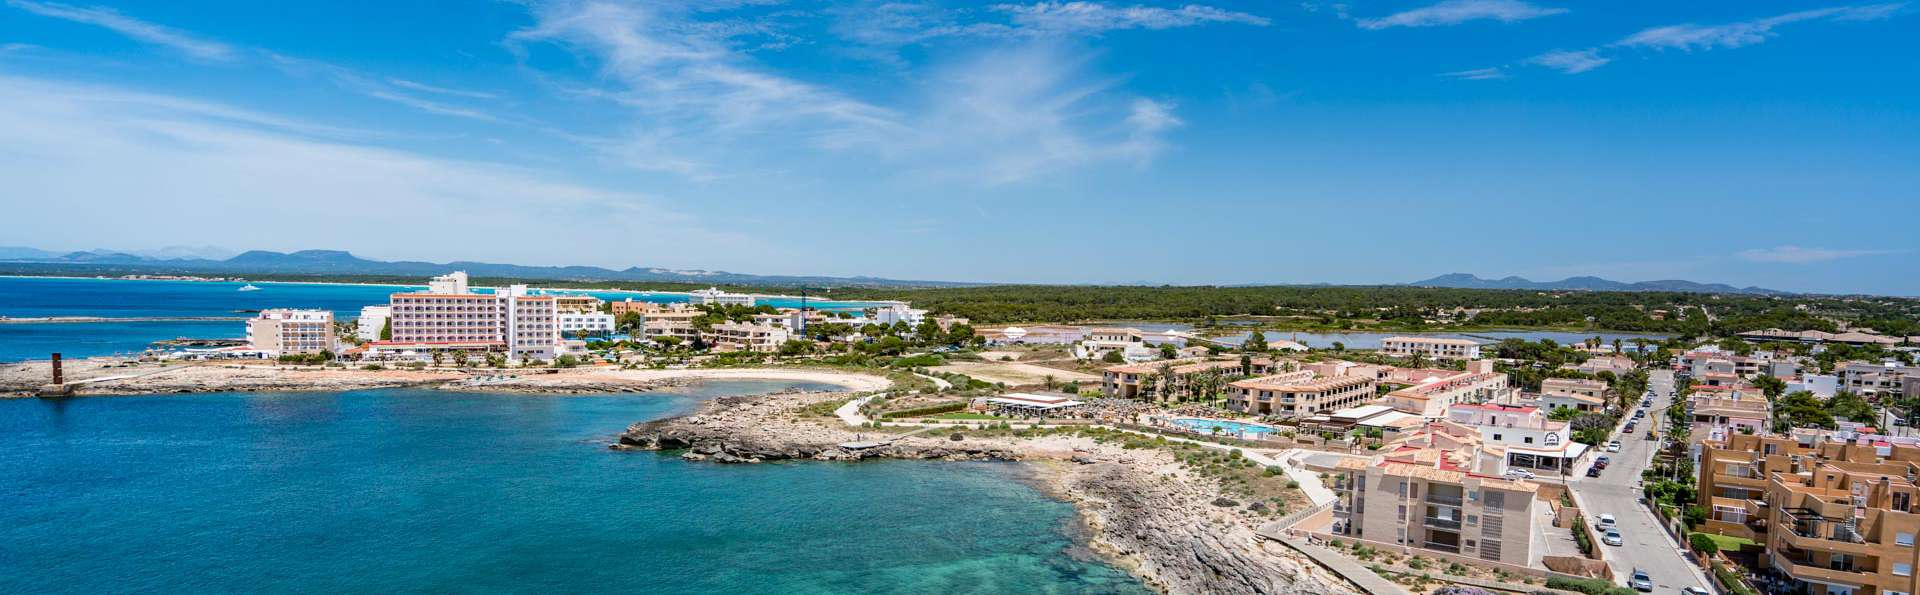 THB Hotel Sur Mallorca - EDIT_SURROUNDING_01.jpg